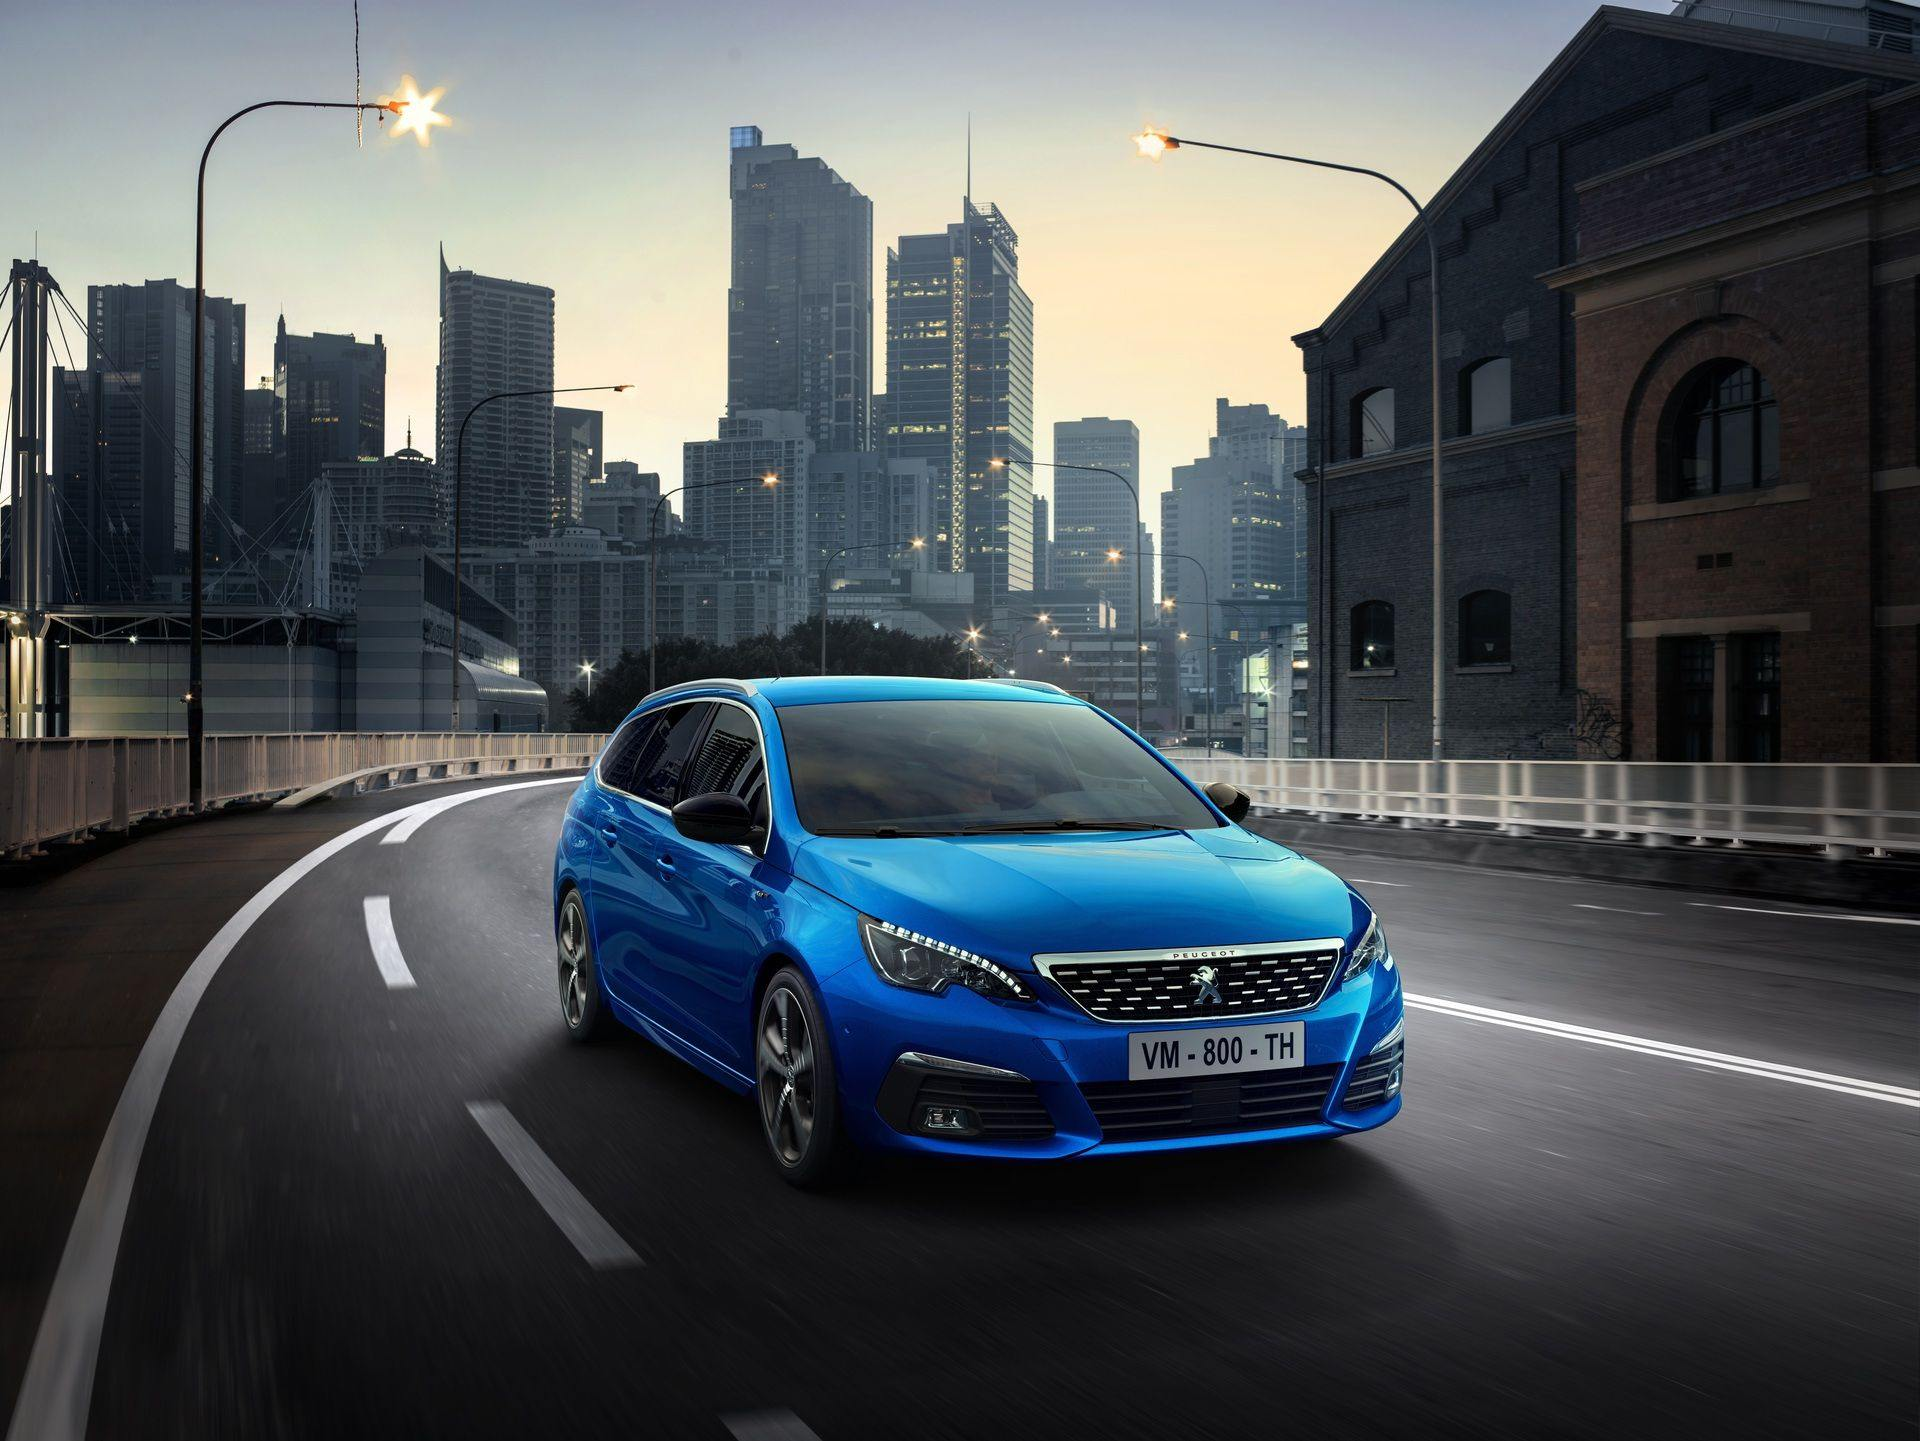 2020_Peugeot_308_facelift_0016